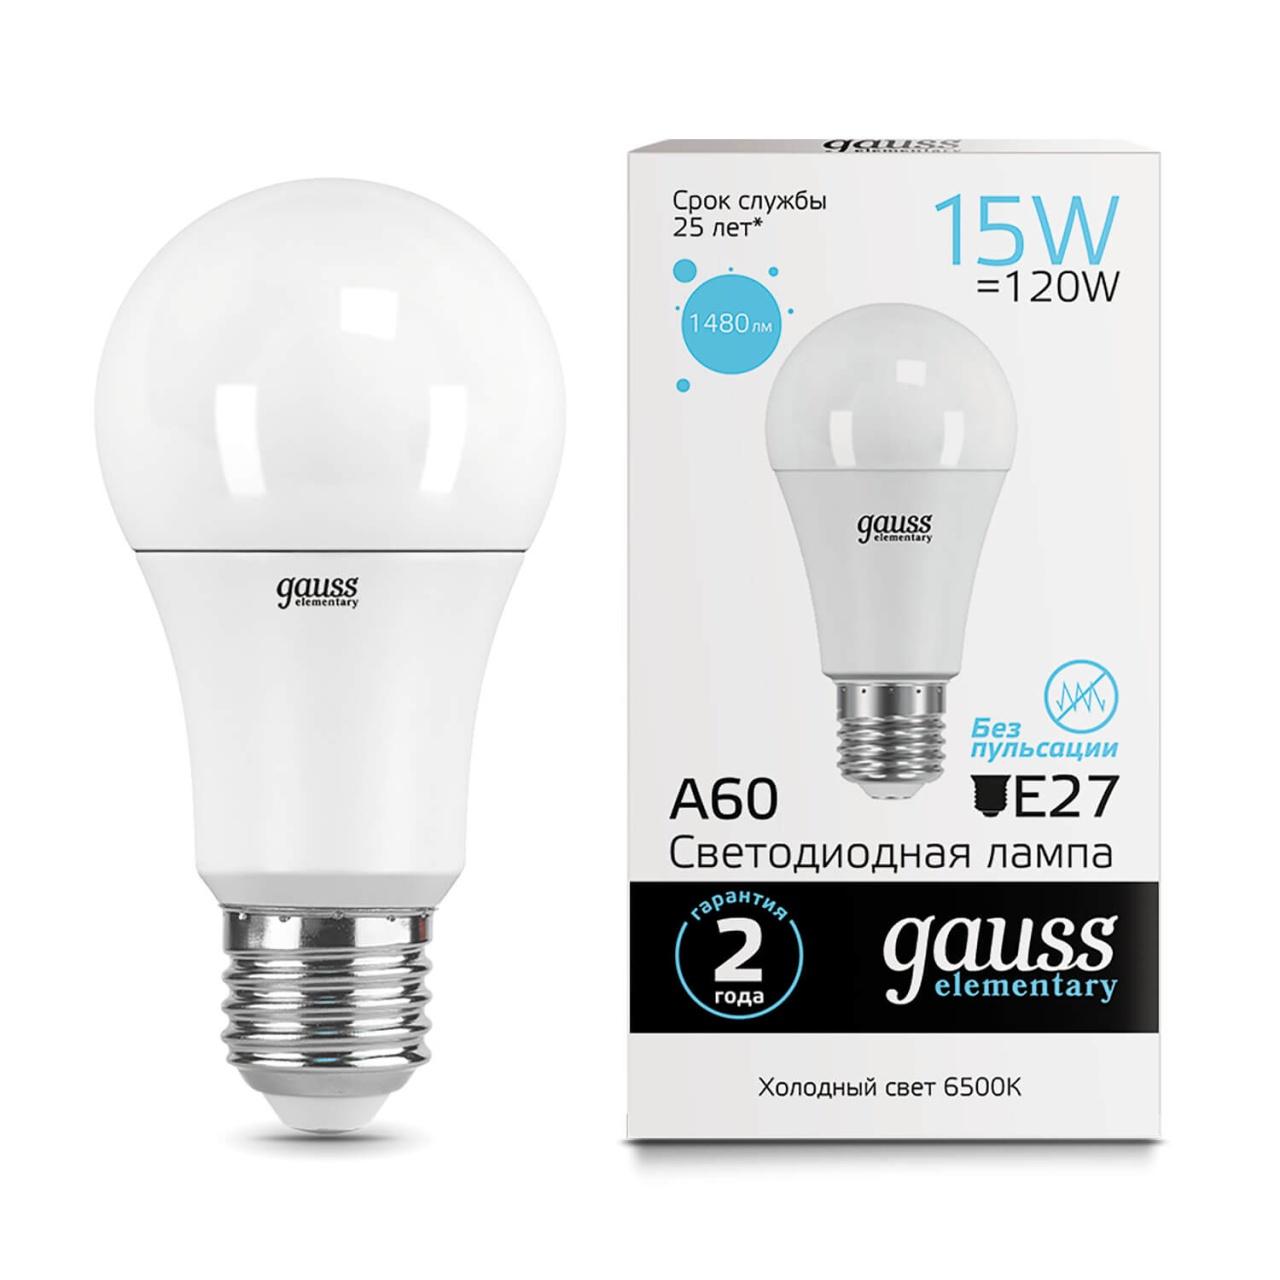 Лампочка Gauss 23235 Elementary шар световой globo weihnachtsengel 23235 0 67 м